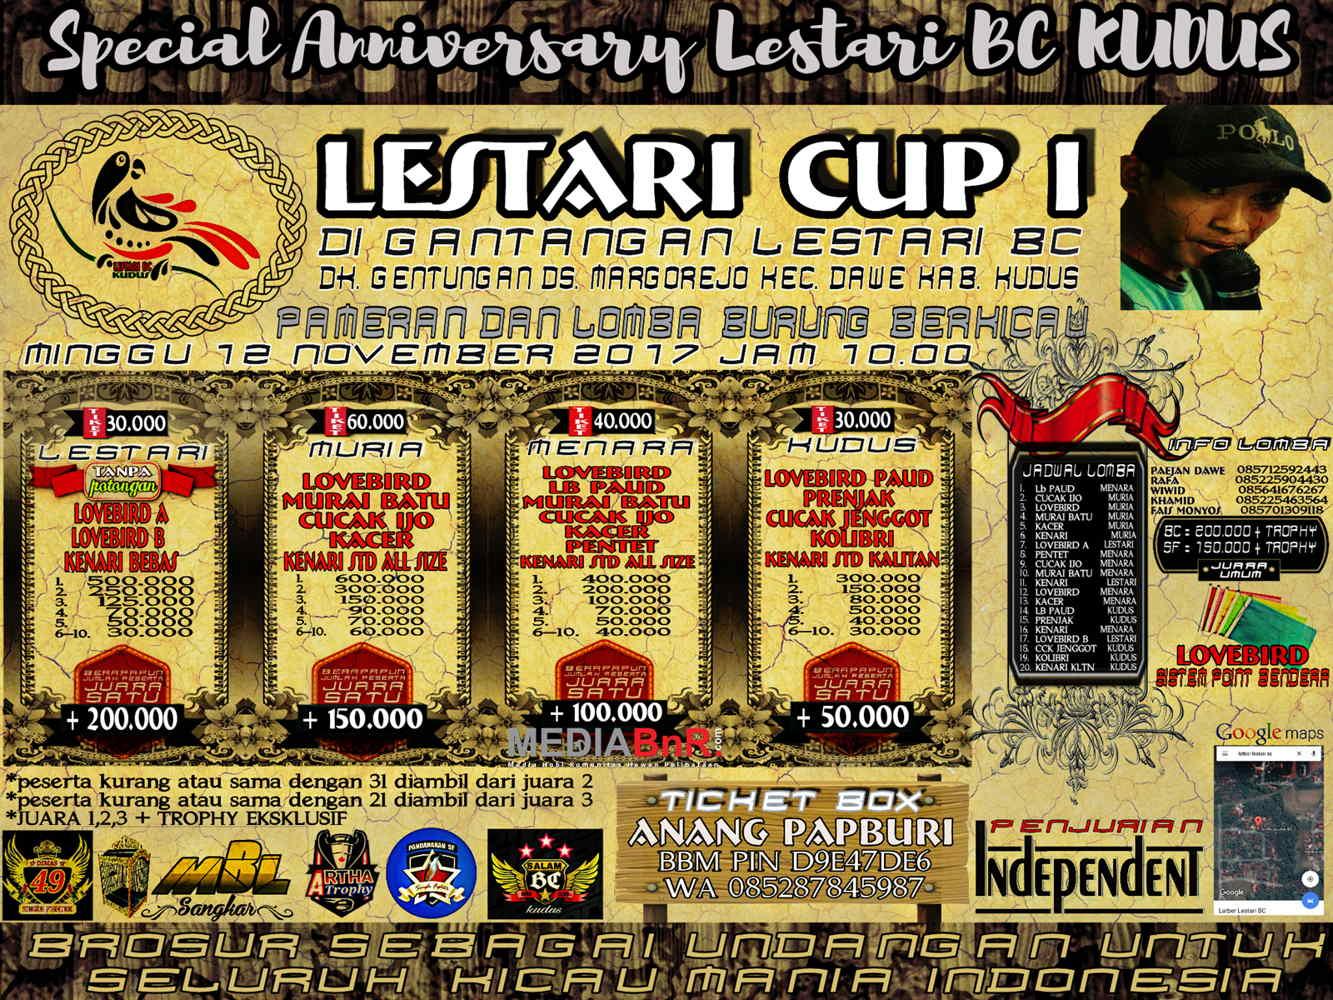 brosur lestari cup 1 12 nov 2017